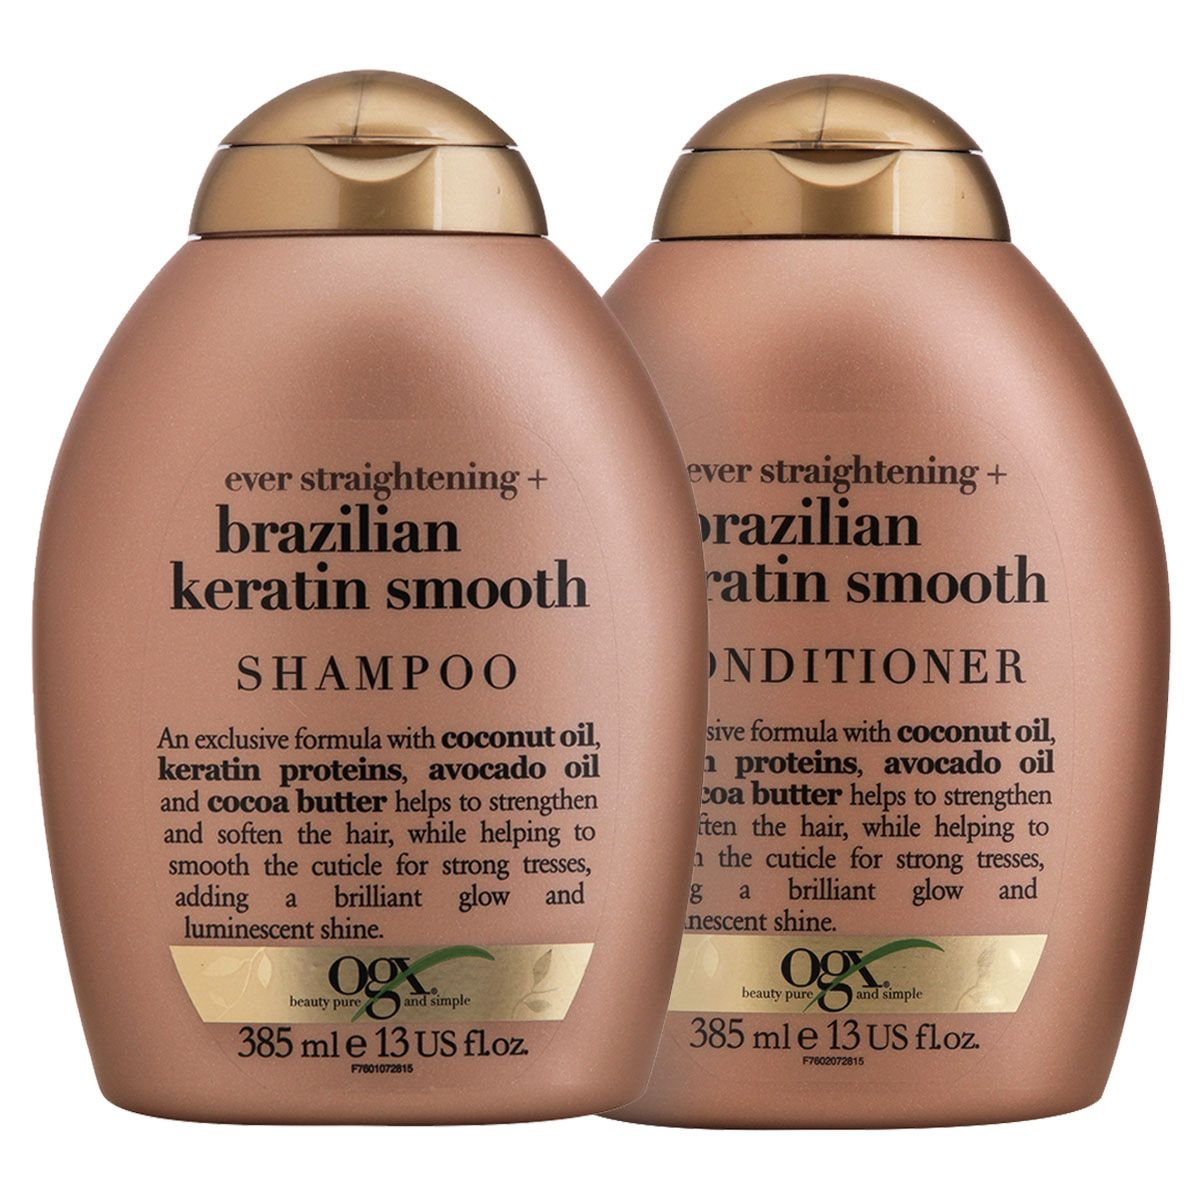 Kit Shampoo OGX Brazilian Keratin Smooth 385ml + Condicionador OGX Brazilian Keratin Smooth 385ml